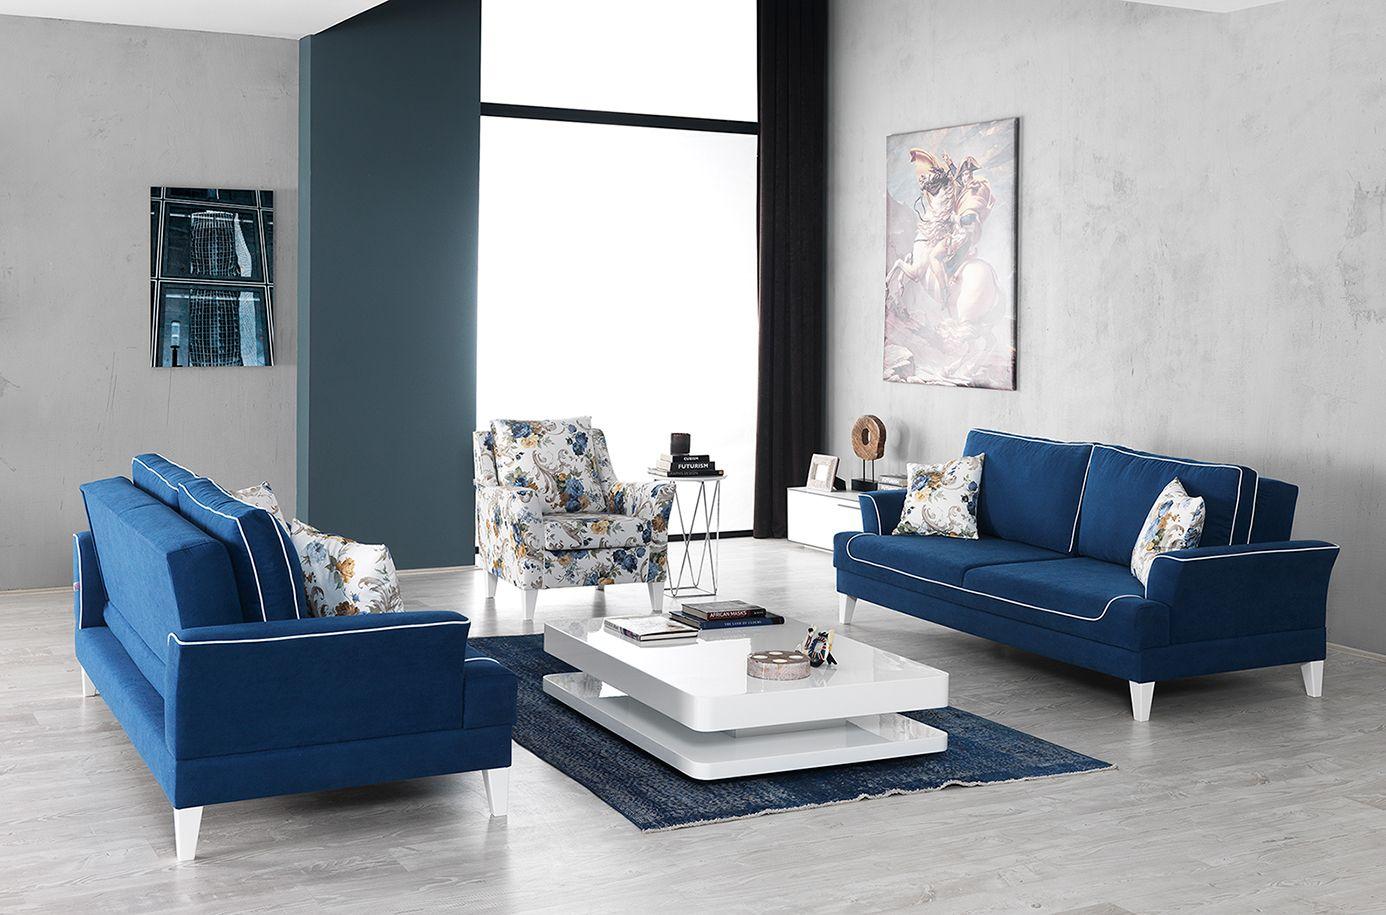 Modern beyaz koltuk tak mlar - The Living Spaces Bloom Bubon Sofa Sets Ya Am Alanlar N Za I Ek A T Ran Bubon Koltuk Tak M Http Www Idermobilya Com Pinterest